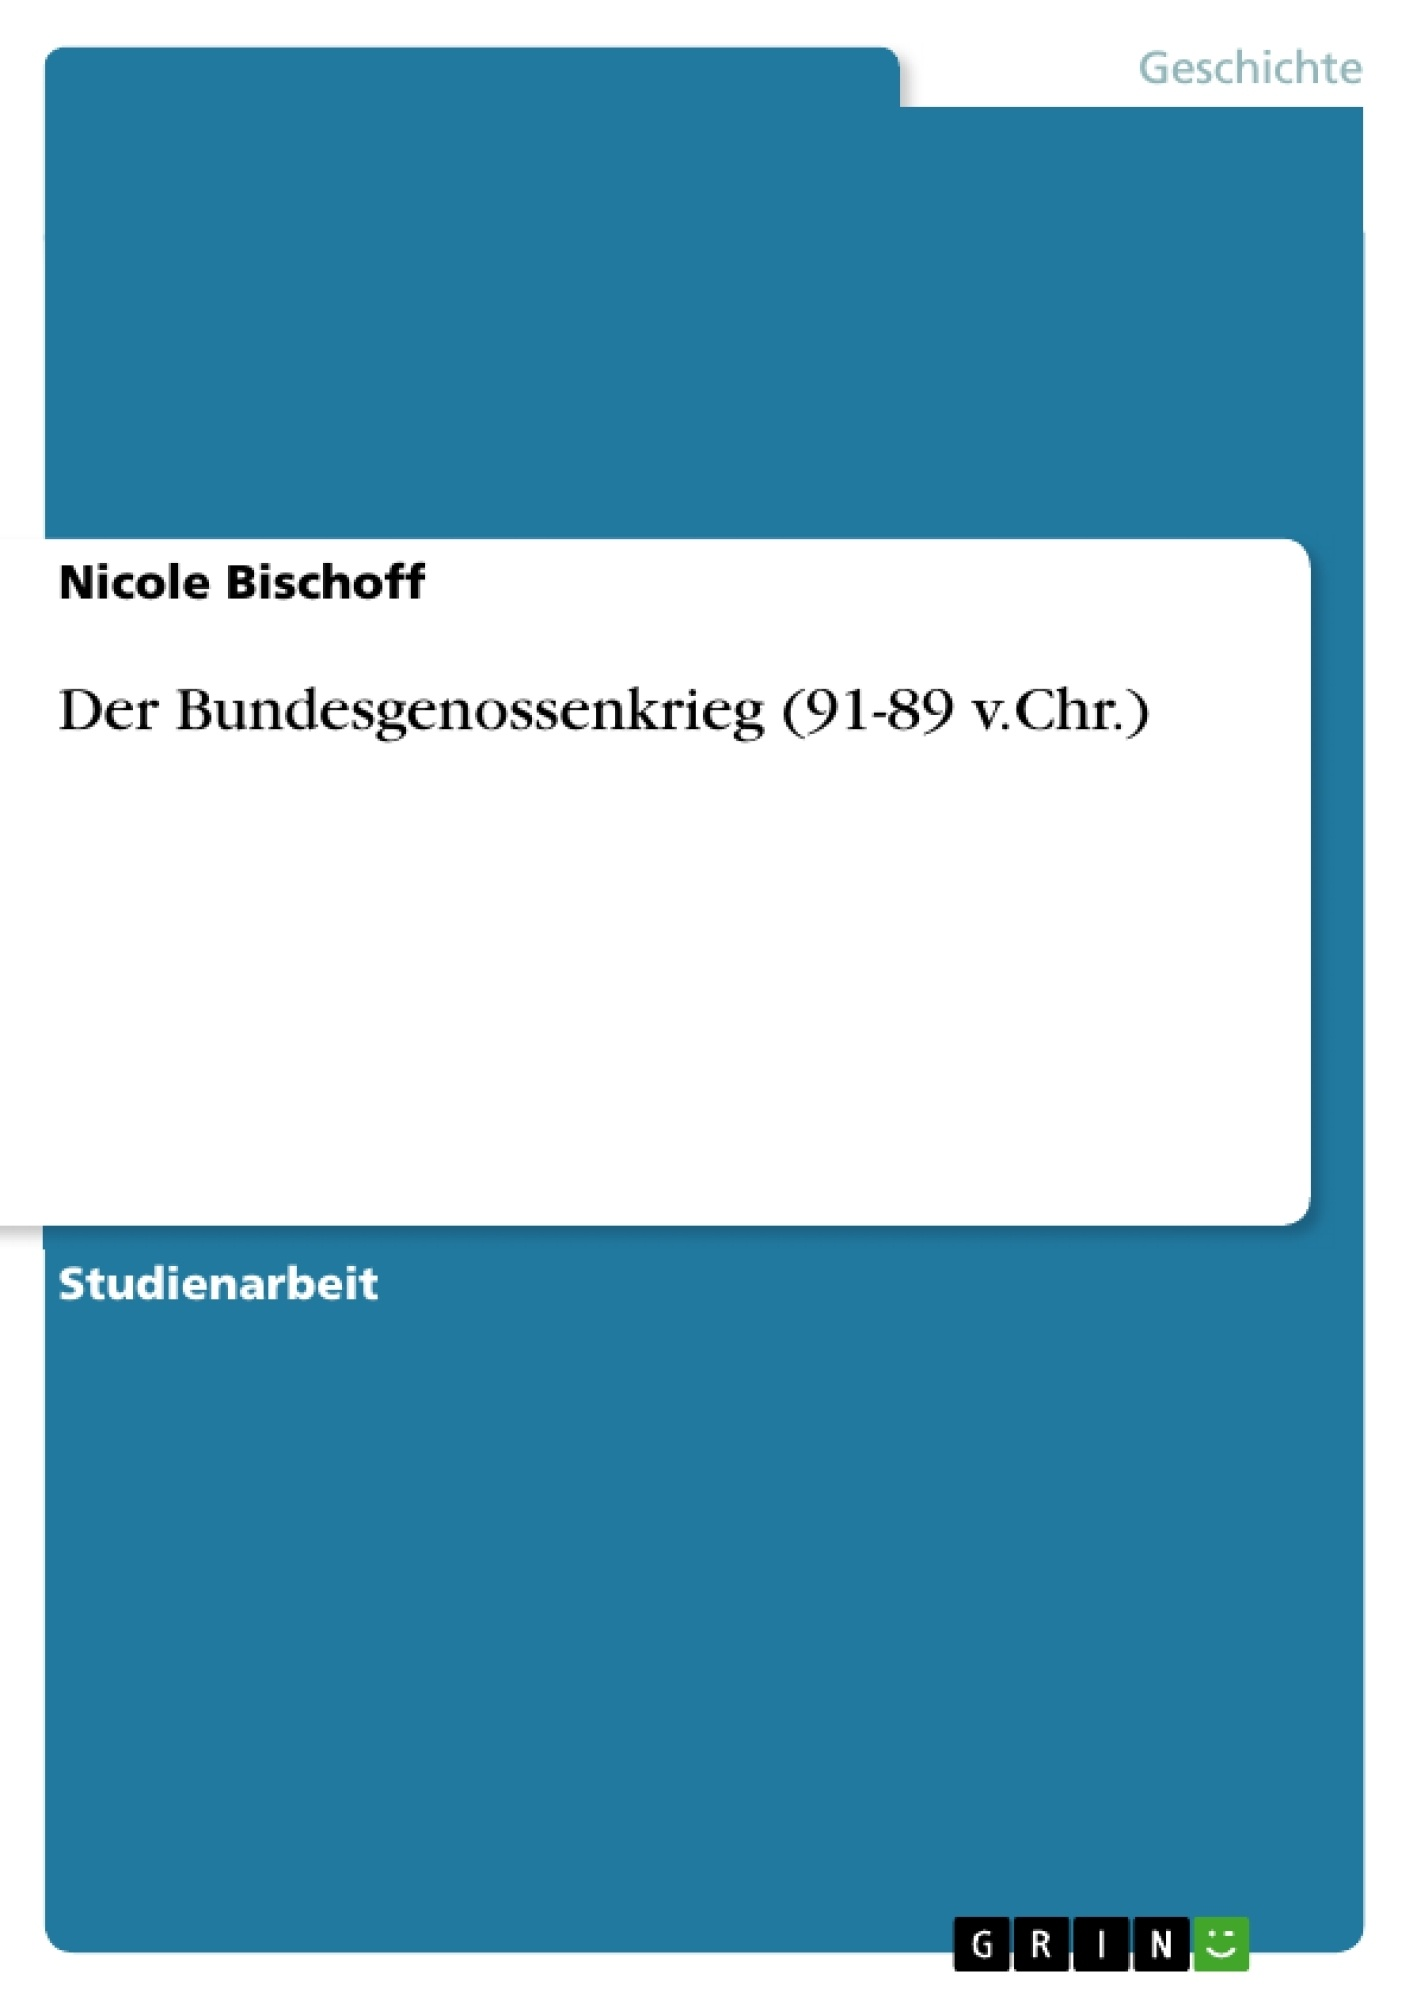 Titel: Der Bundesgenossenkrieg (91-89 v.Chr.)